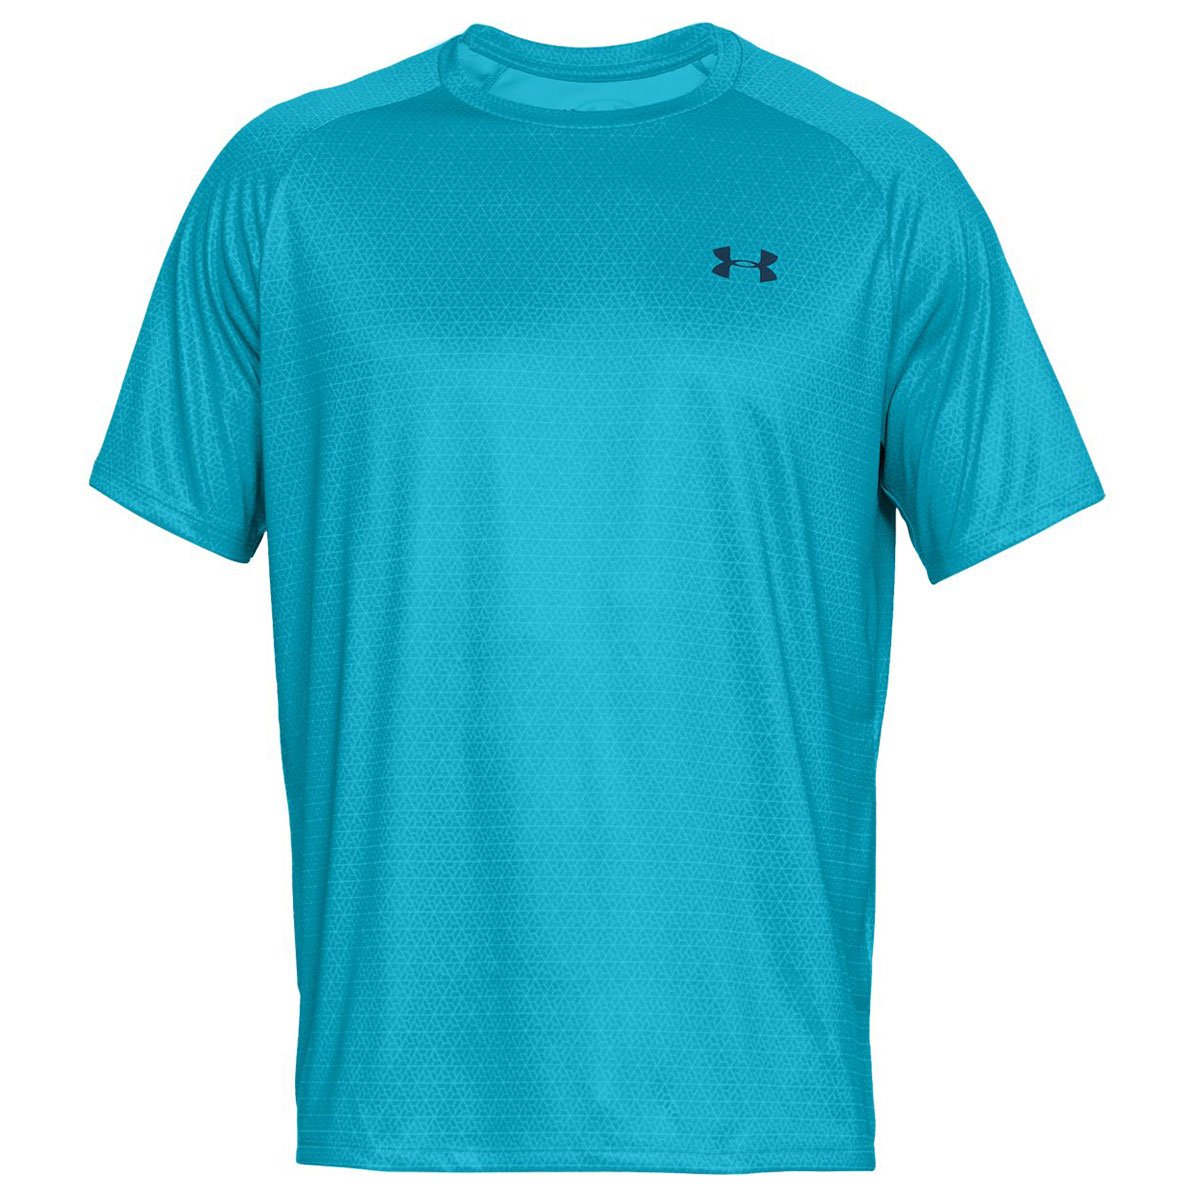 Under-Armour-Mens-UA-Tech-SS-Printed-Moisture-Wicking-T-Shirt-Tee-27-OFF-RRP thumbnail 12